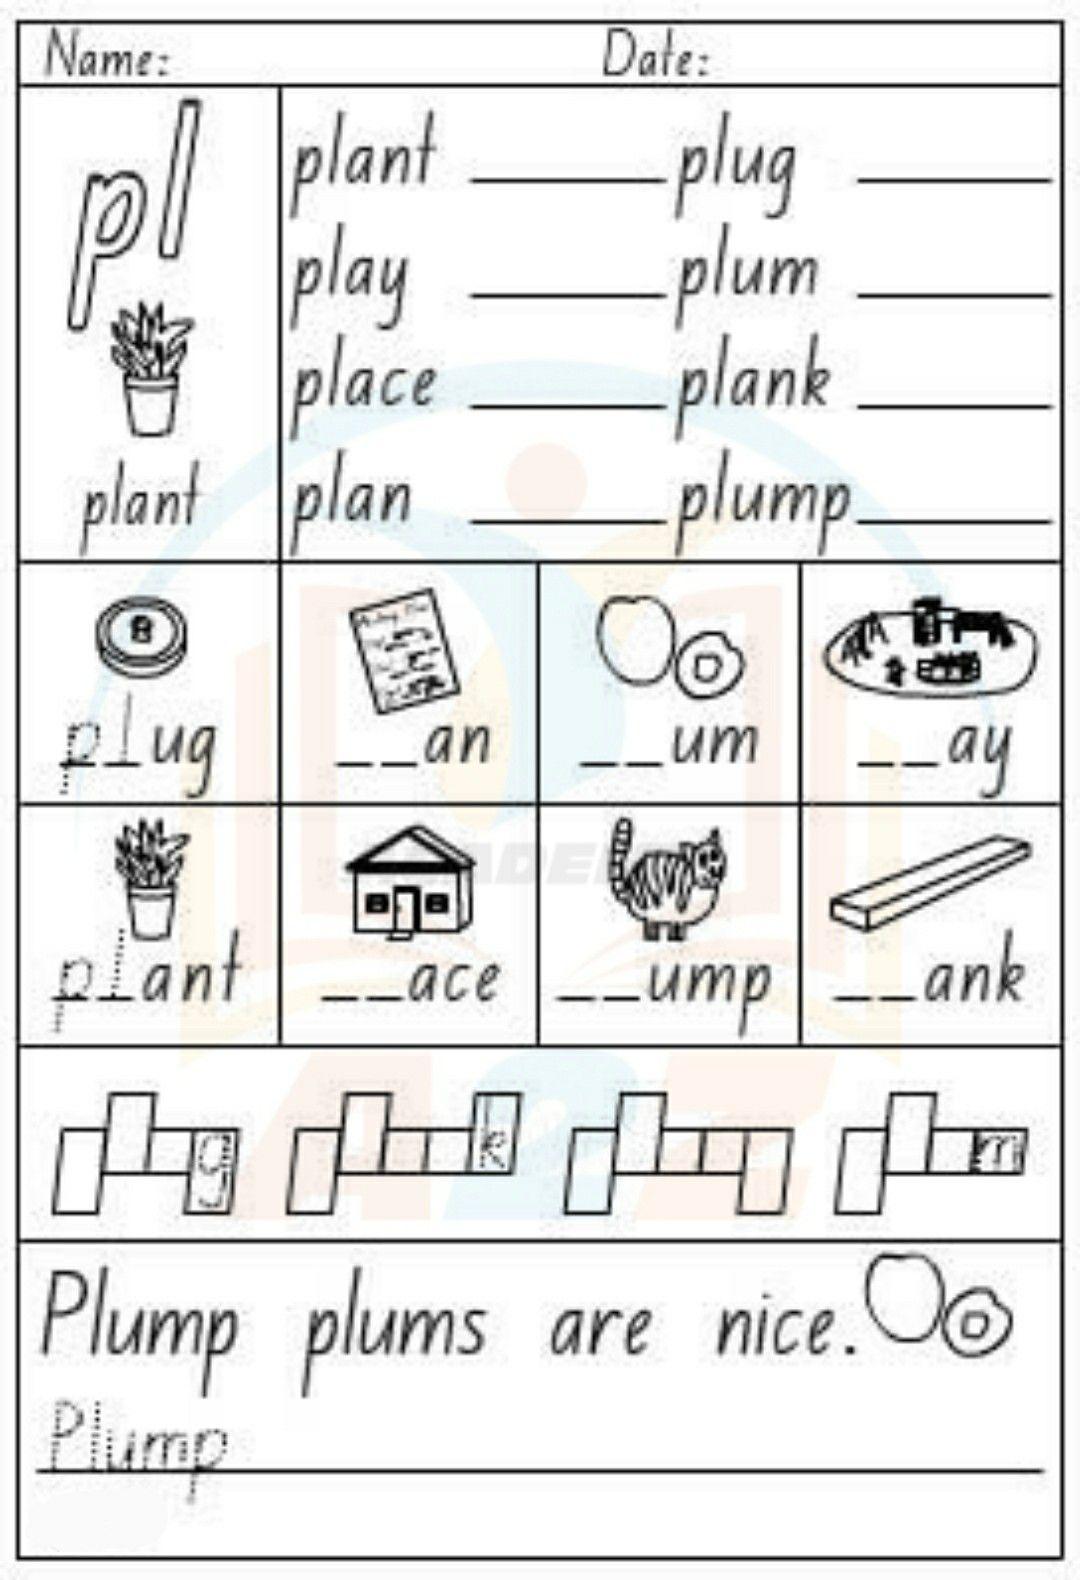 Grade 1 Phonics Worksheet Pl Words In 2020 Phonics Worksheets 1st Grade Worksheets Worksheets